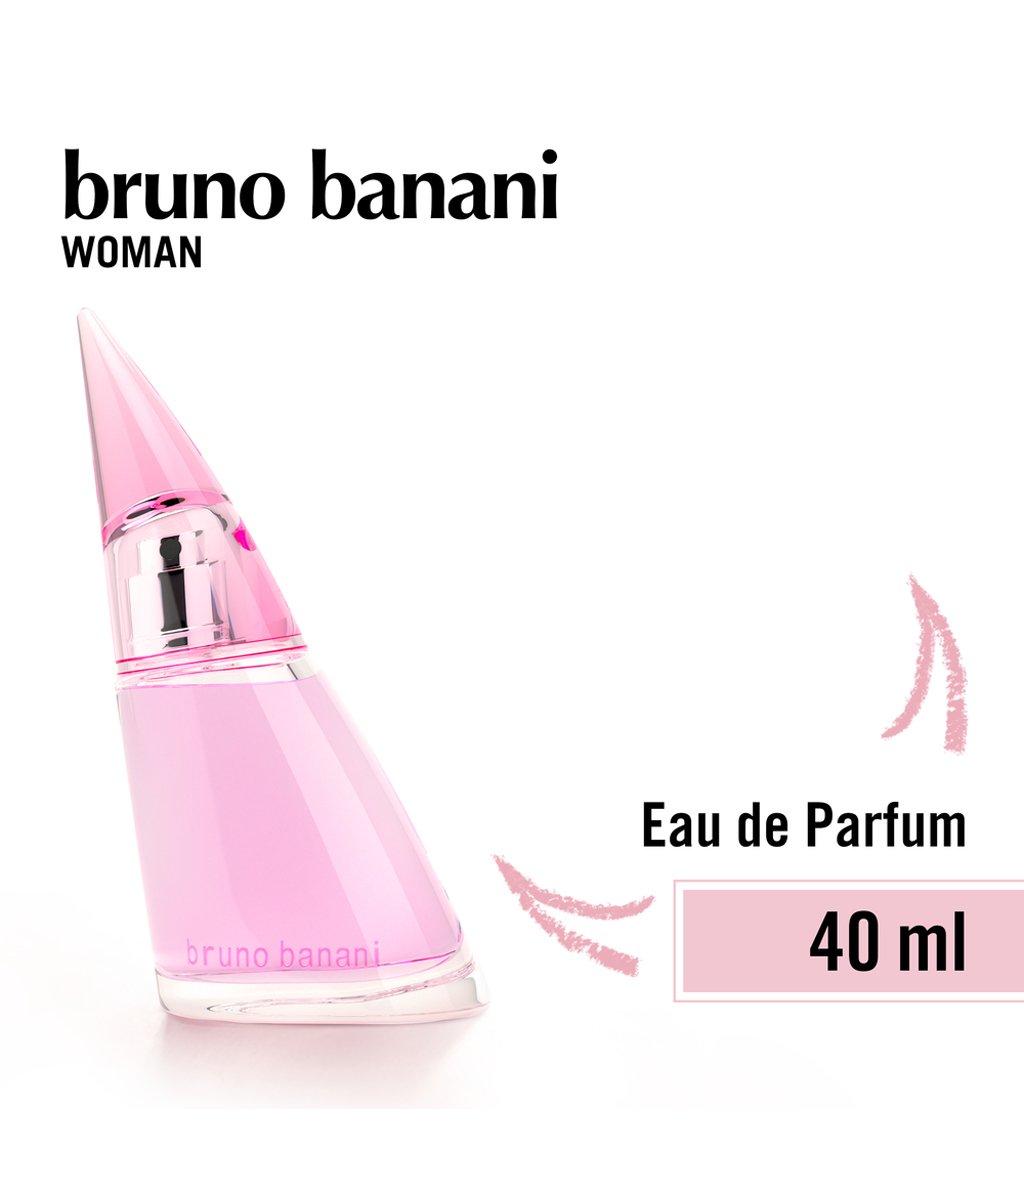 bruno banani woman intense eau de parfum bestellen flaconi. Black Bedroom Furniture Sets. Home Design Ideas